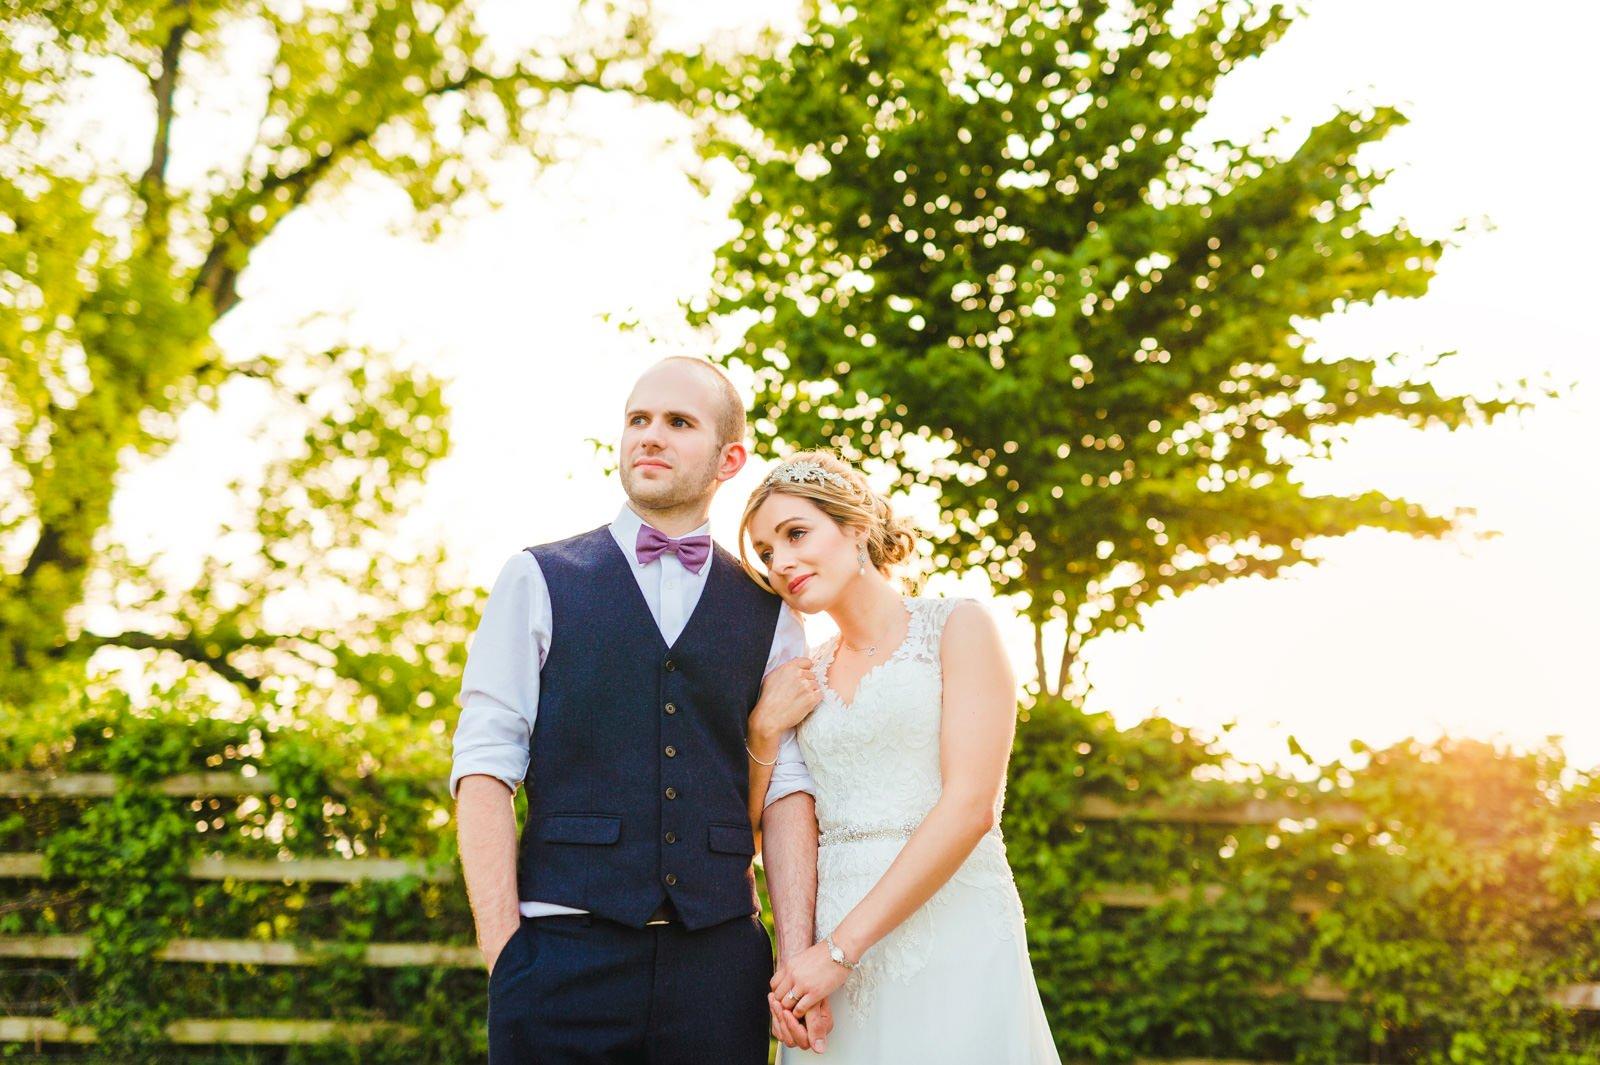 Millers Of Netley wedding, Dorrington, Shrewsbury | Emma + Ben 83